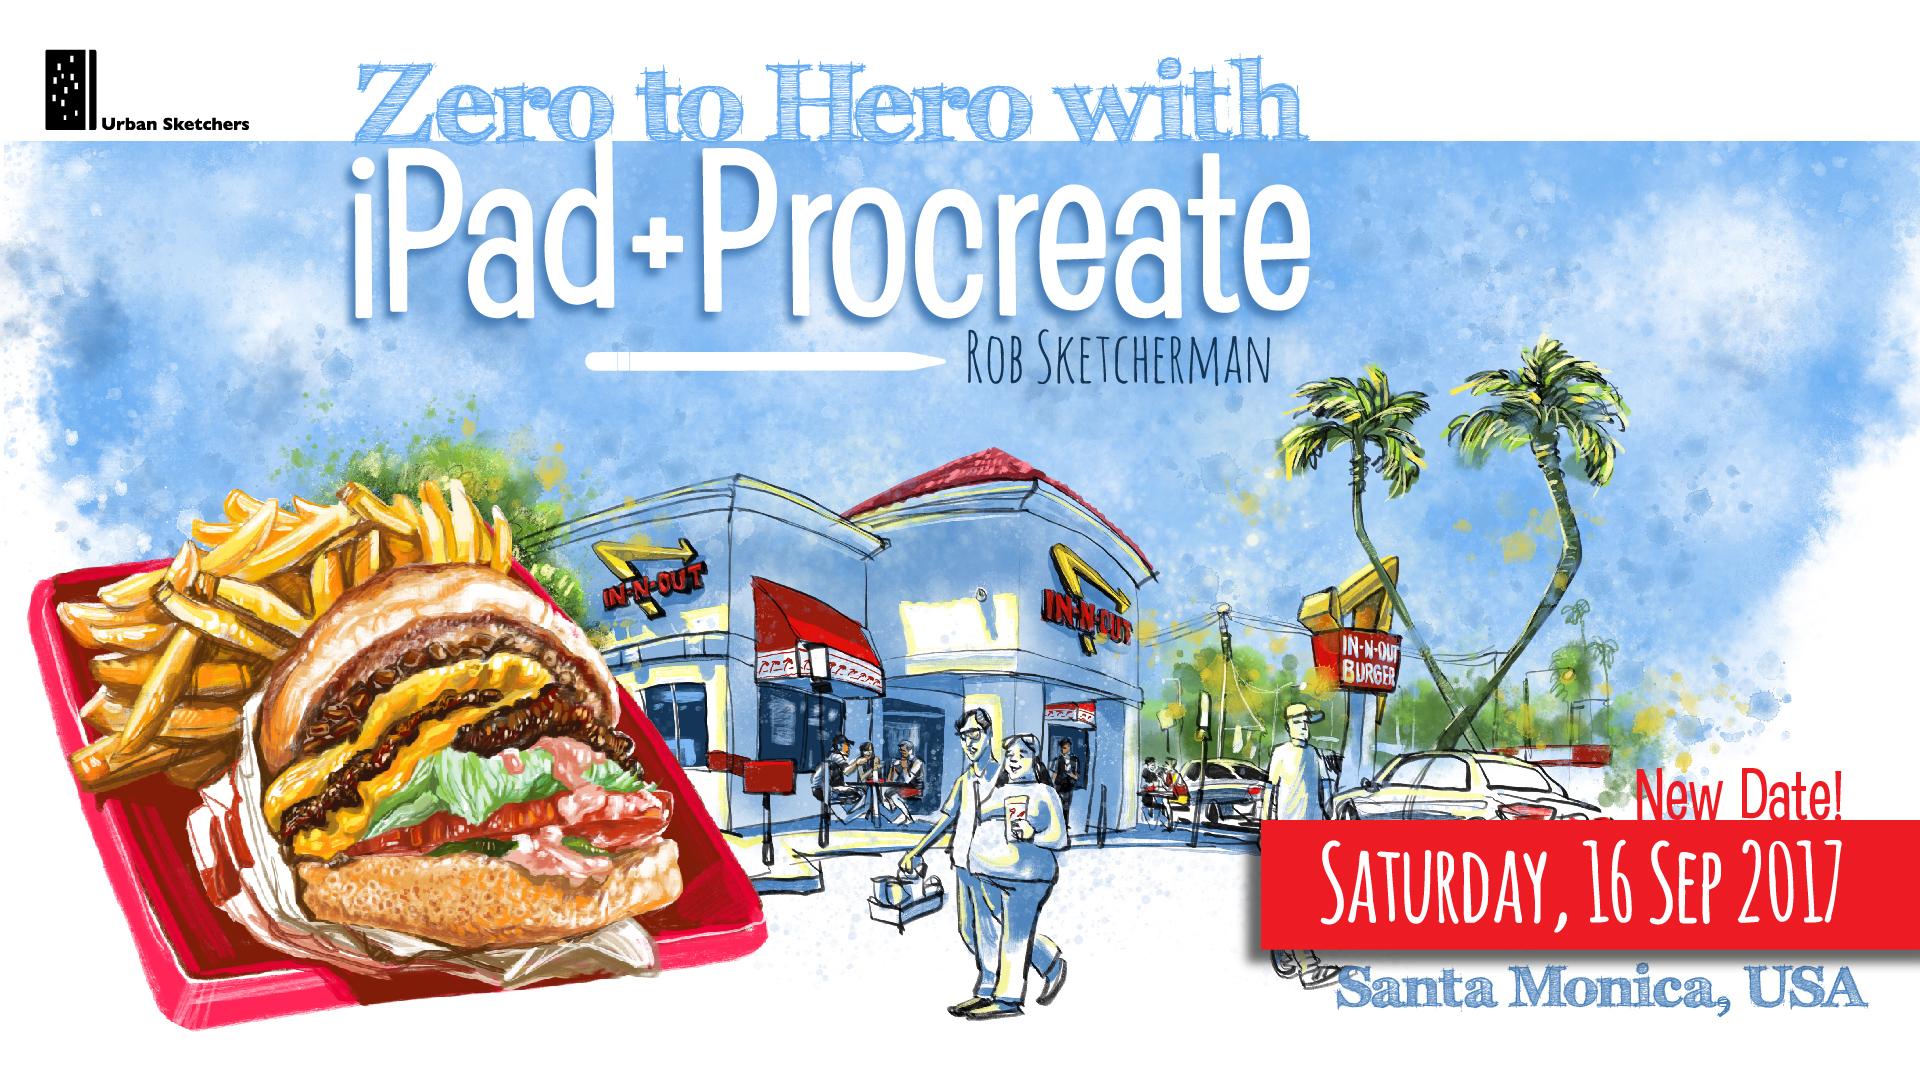 LA Zero-to-hero with iPad and Procreate-Sketcherman site.jpg